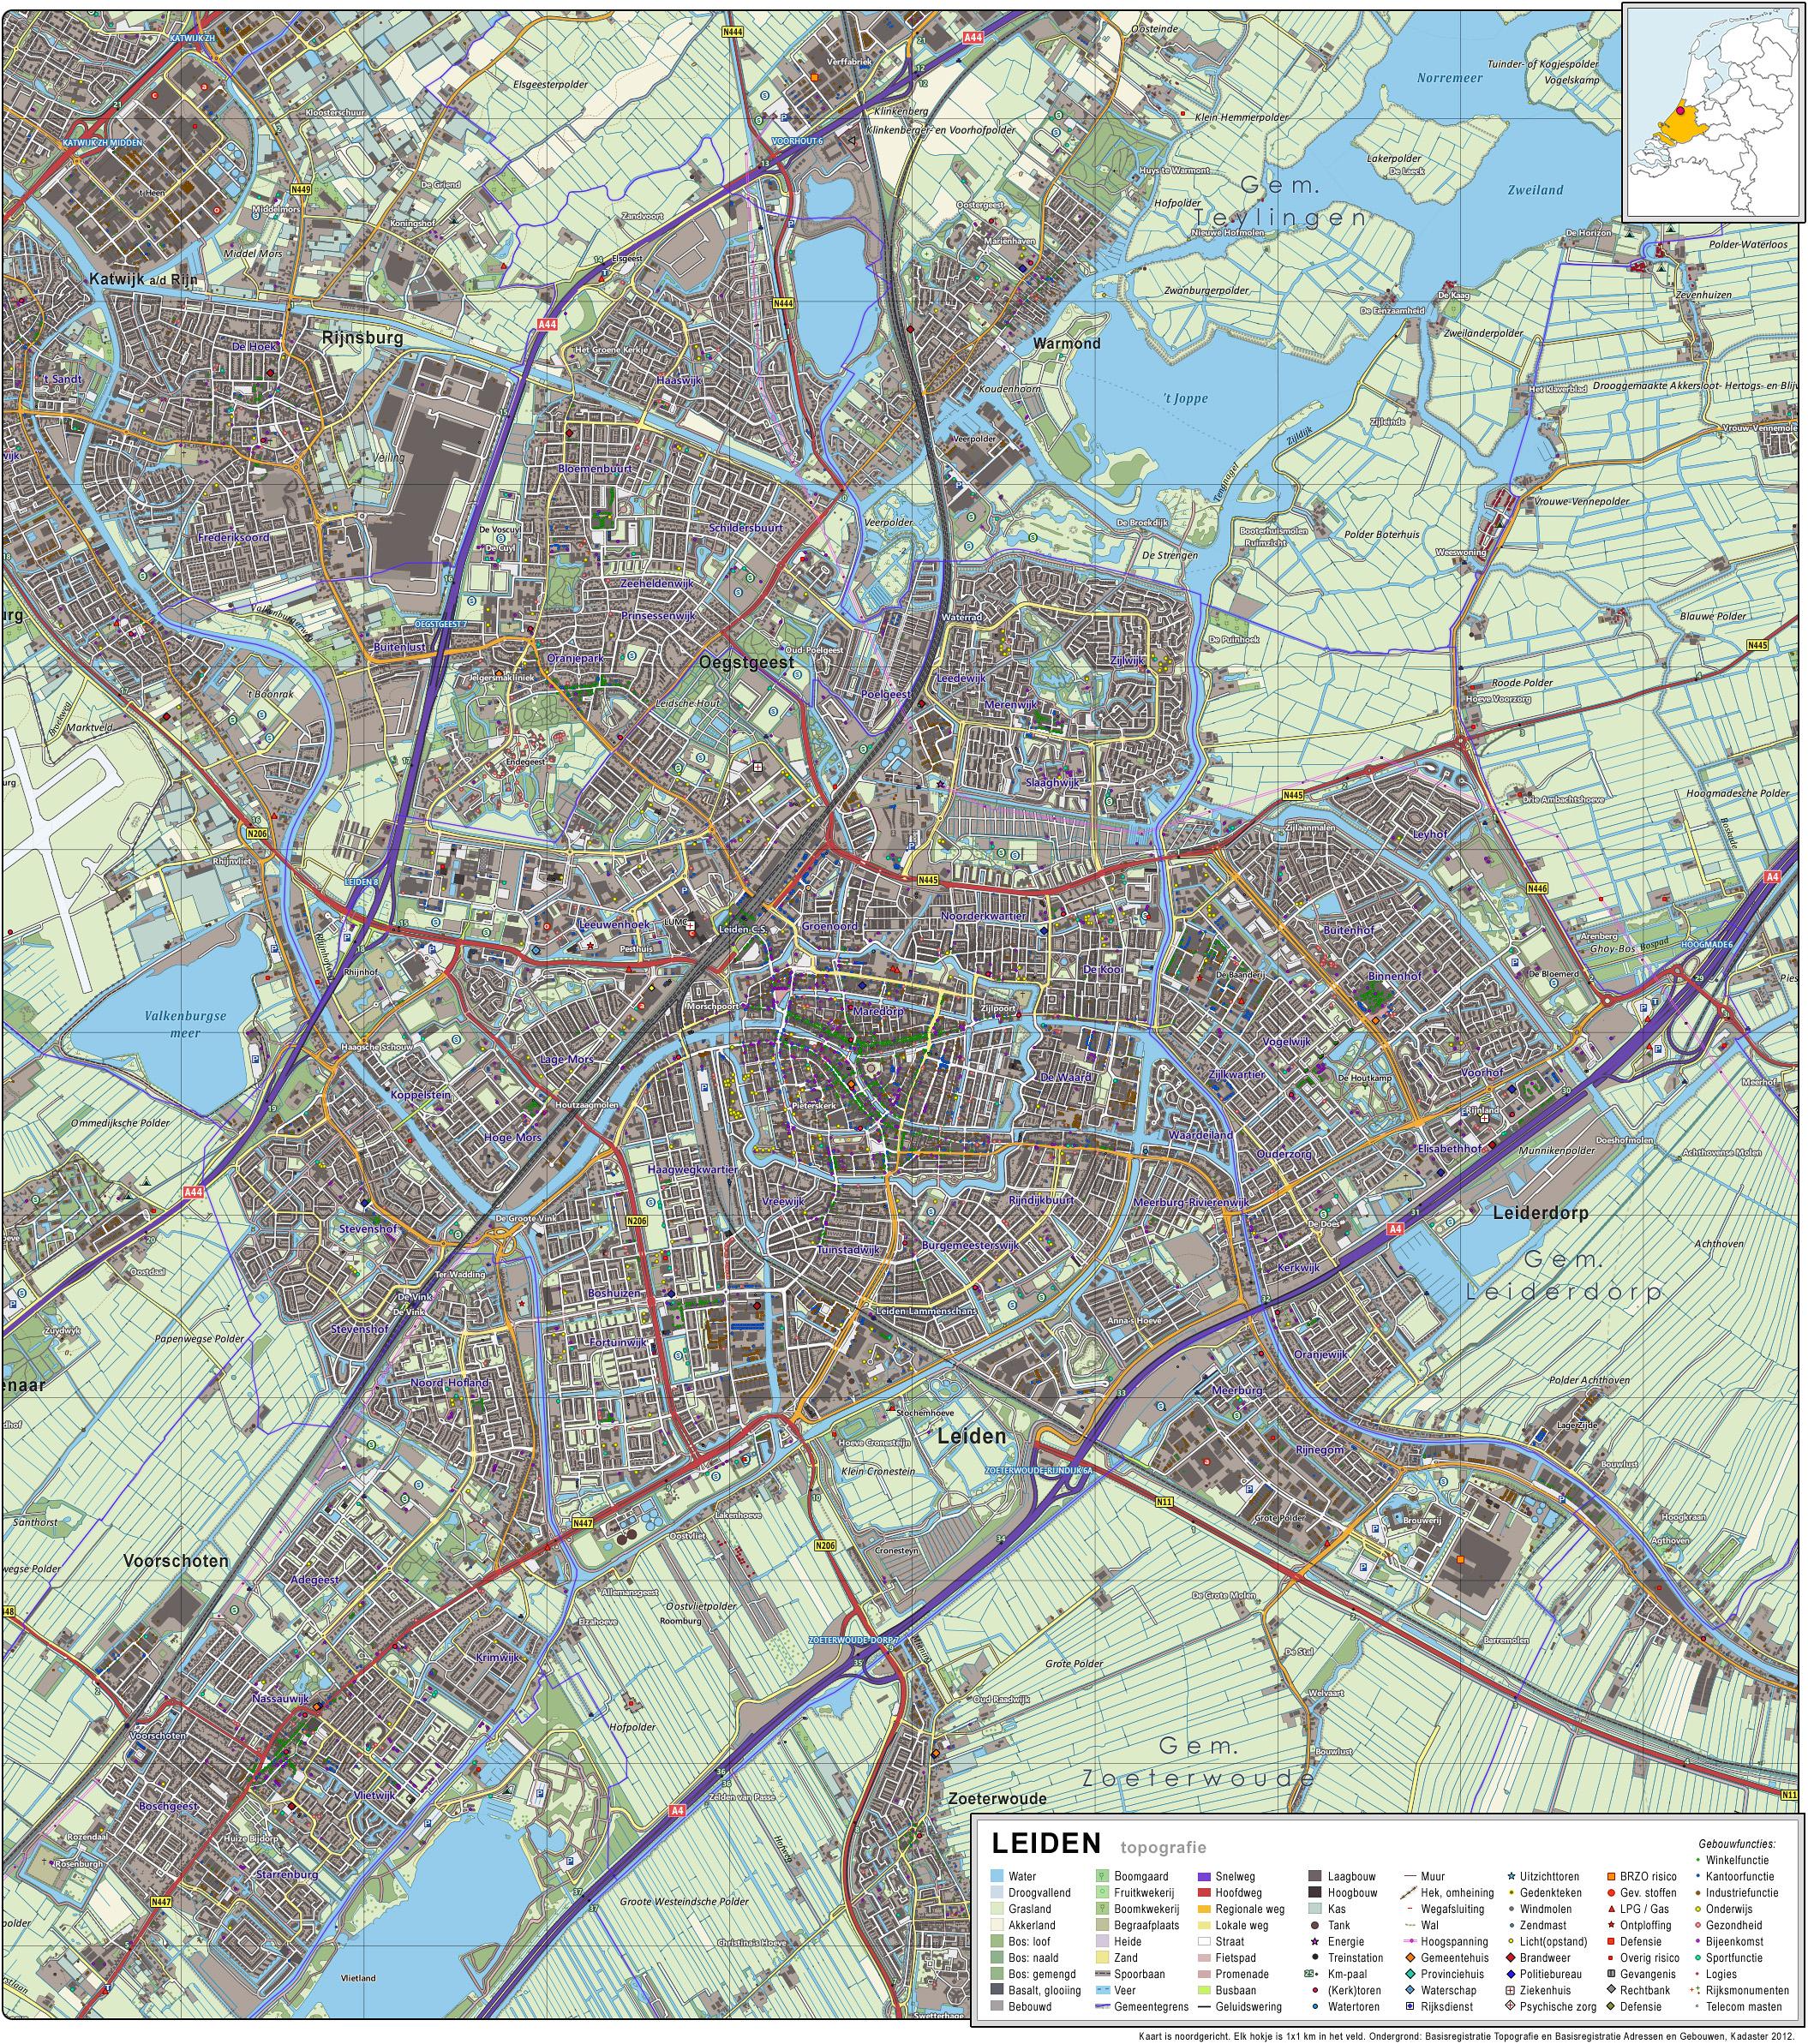 Leiden Familypedia FANDOM powered by Wikia